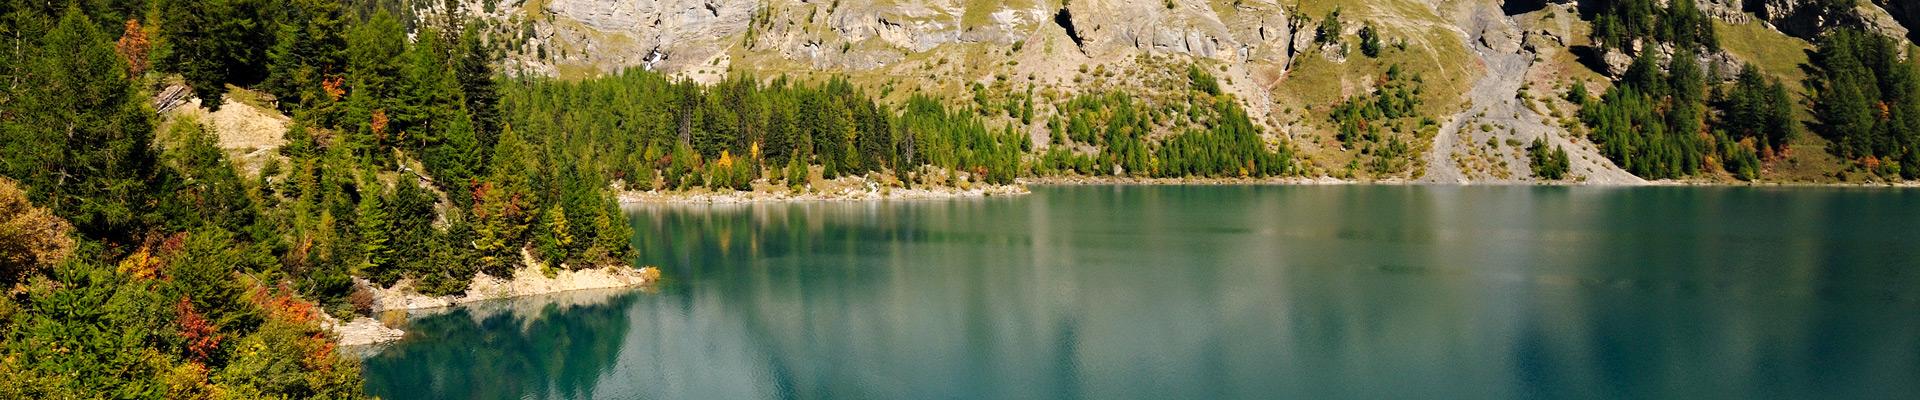 Top image Lac de Tseuzier en Valais, Suisse